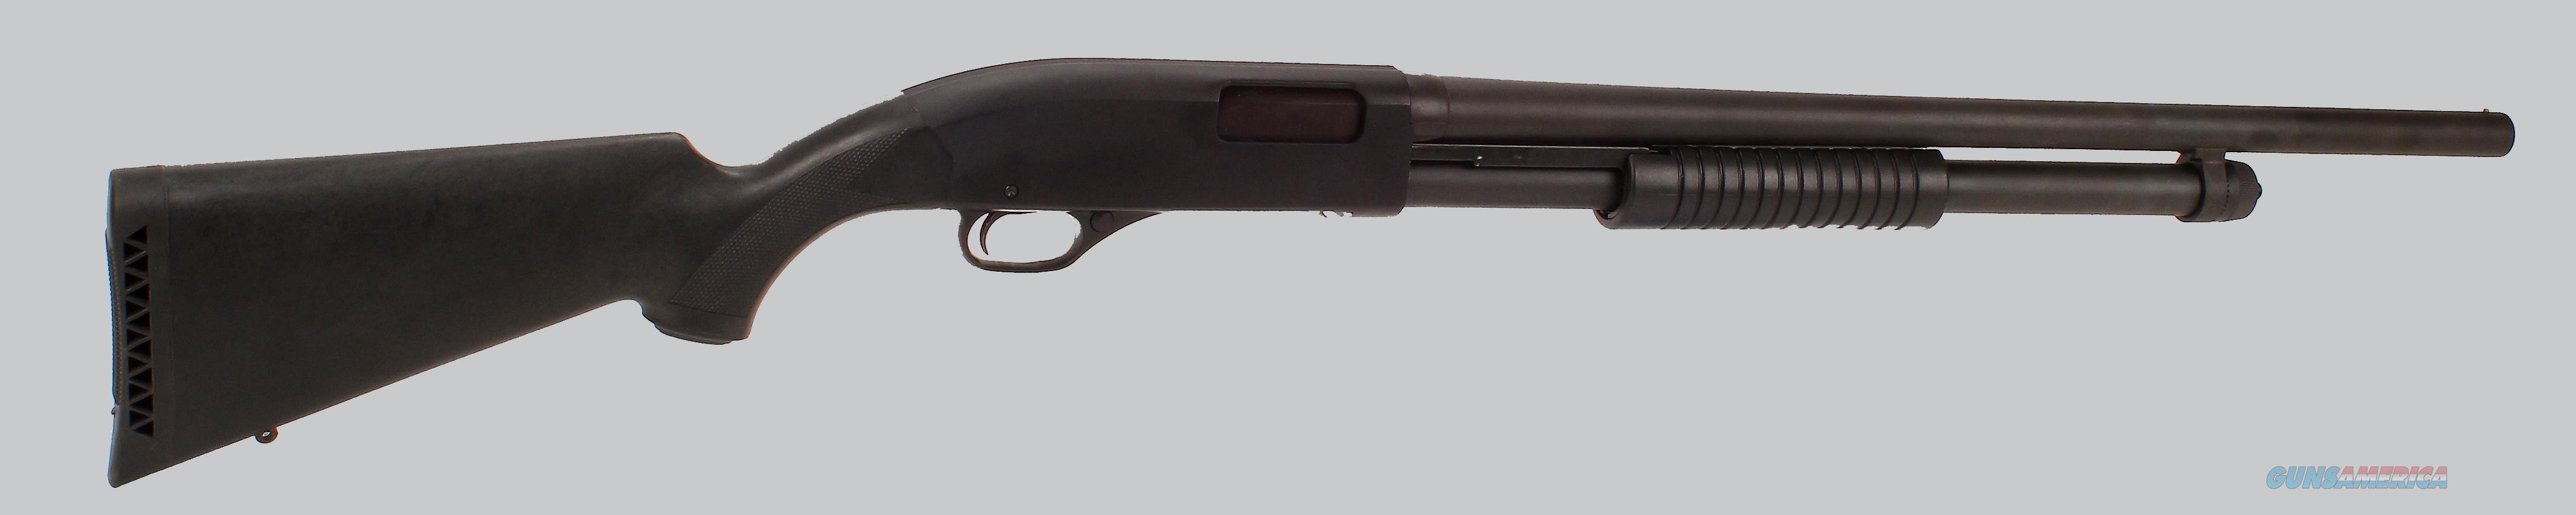 Winchester 1300 Pump 12ga Shotgun  Guns > Shotguns > Winchester Shotguns - Modern > Pump Action > Hunting